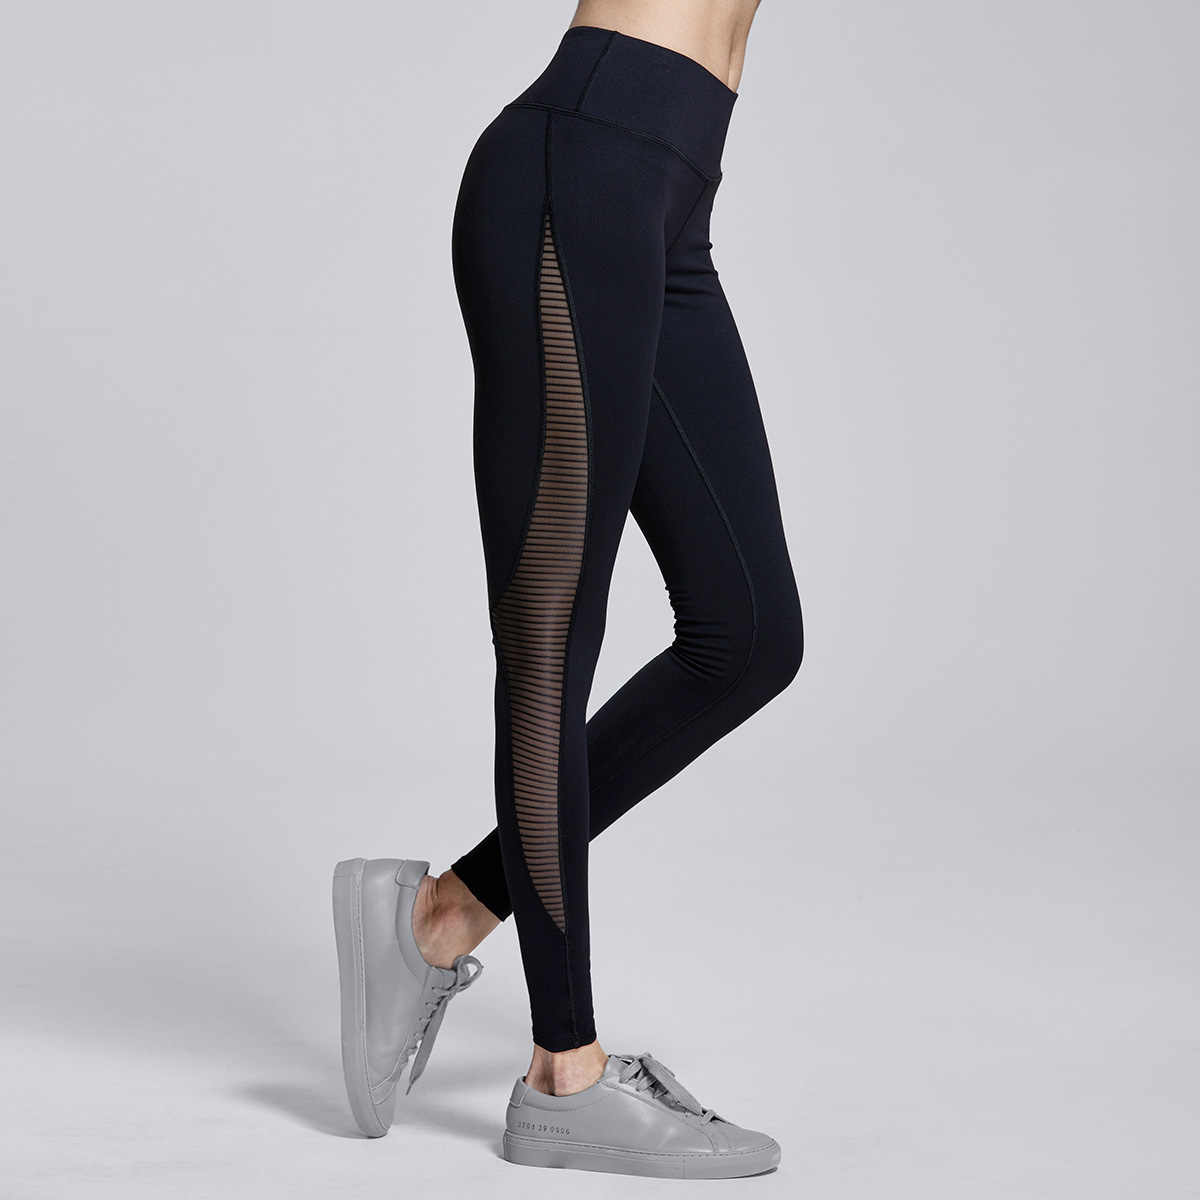 3979a0db306912 ... CRZ YOGA Women's Sports 4-Way-Stretch Tights Workout Yoga Leggings High  Waisted Gym ...